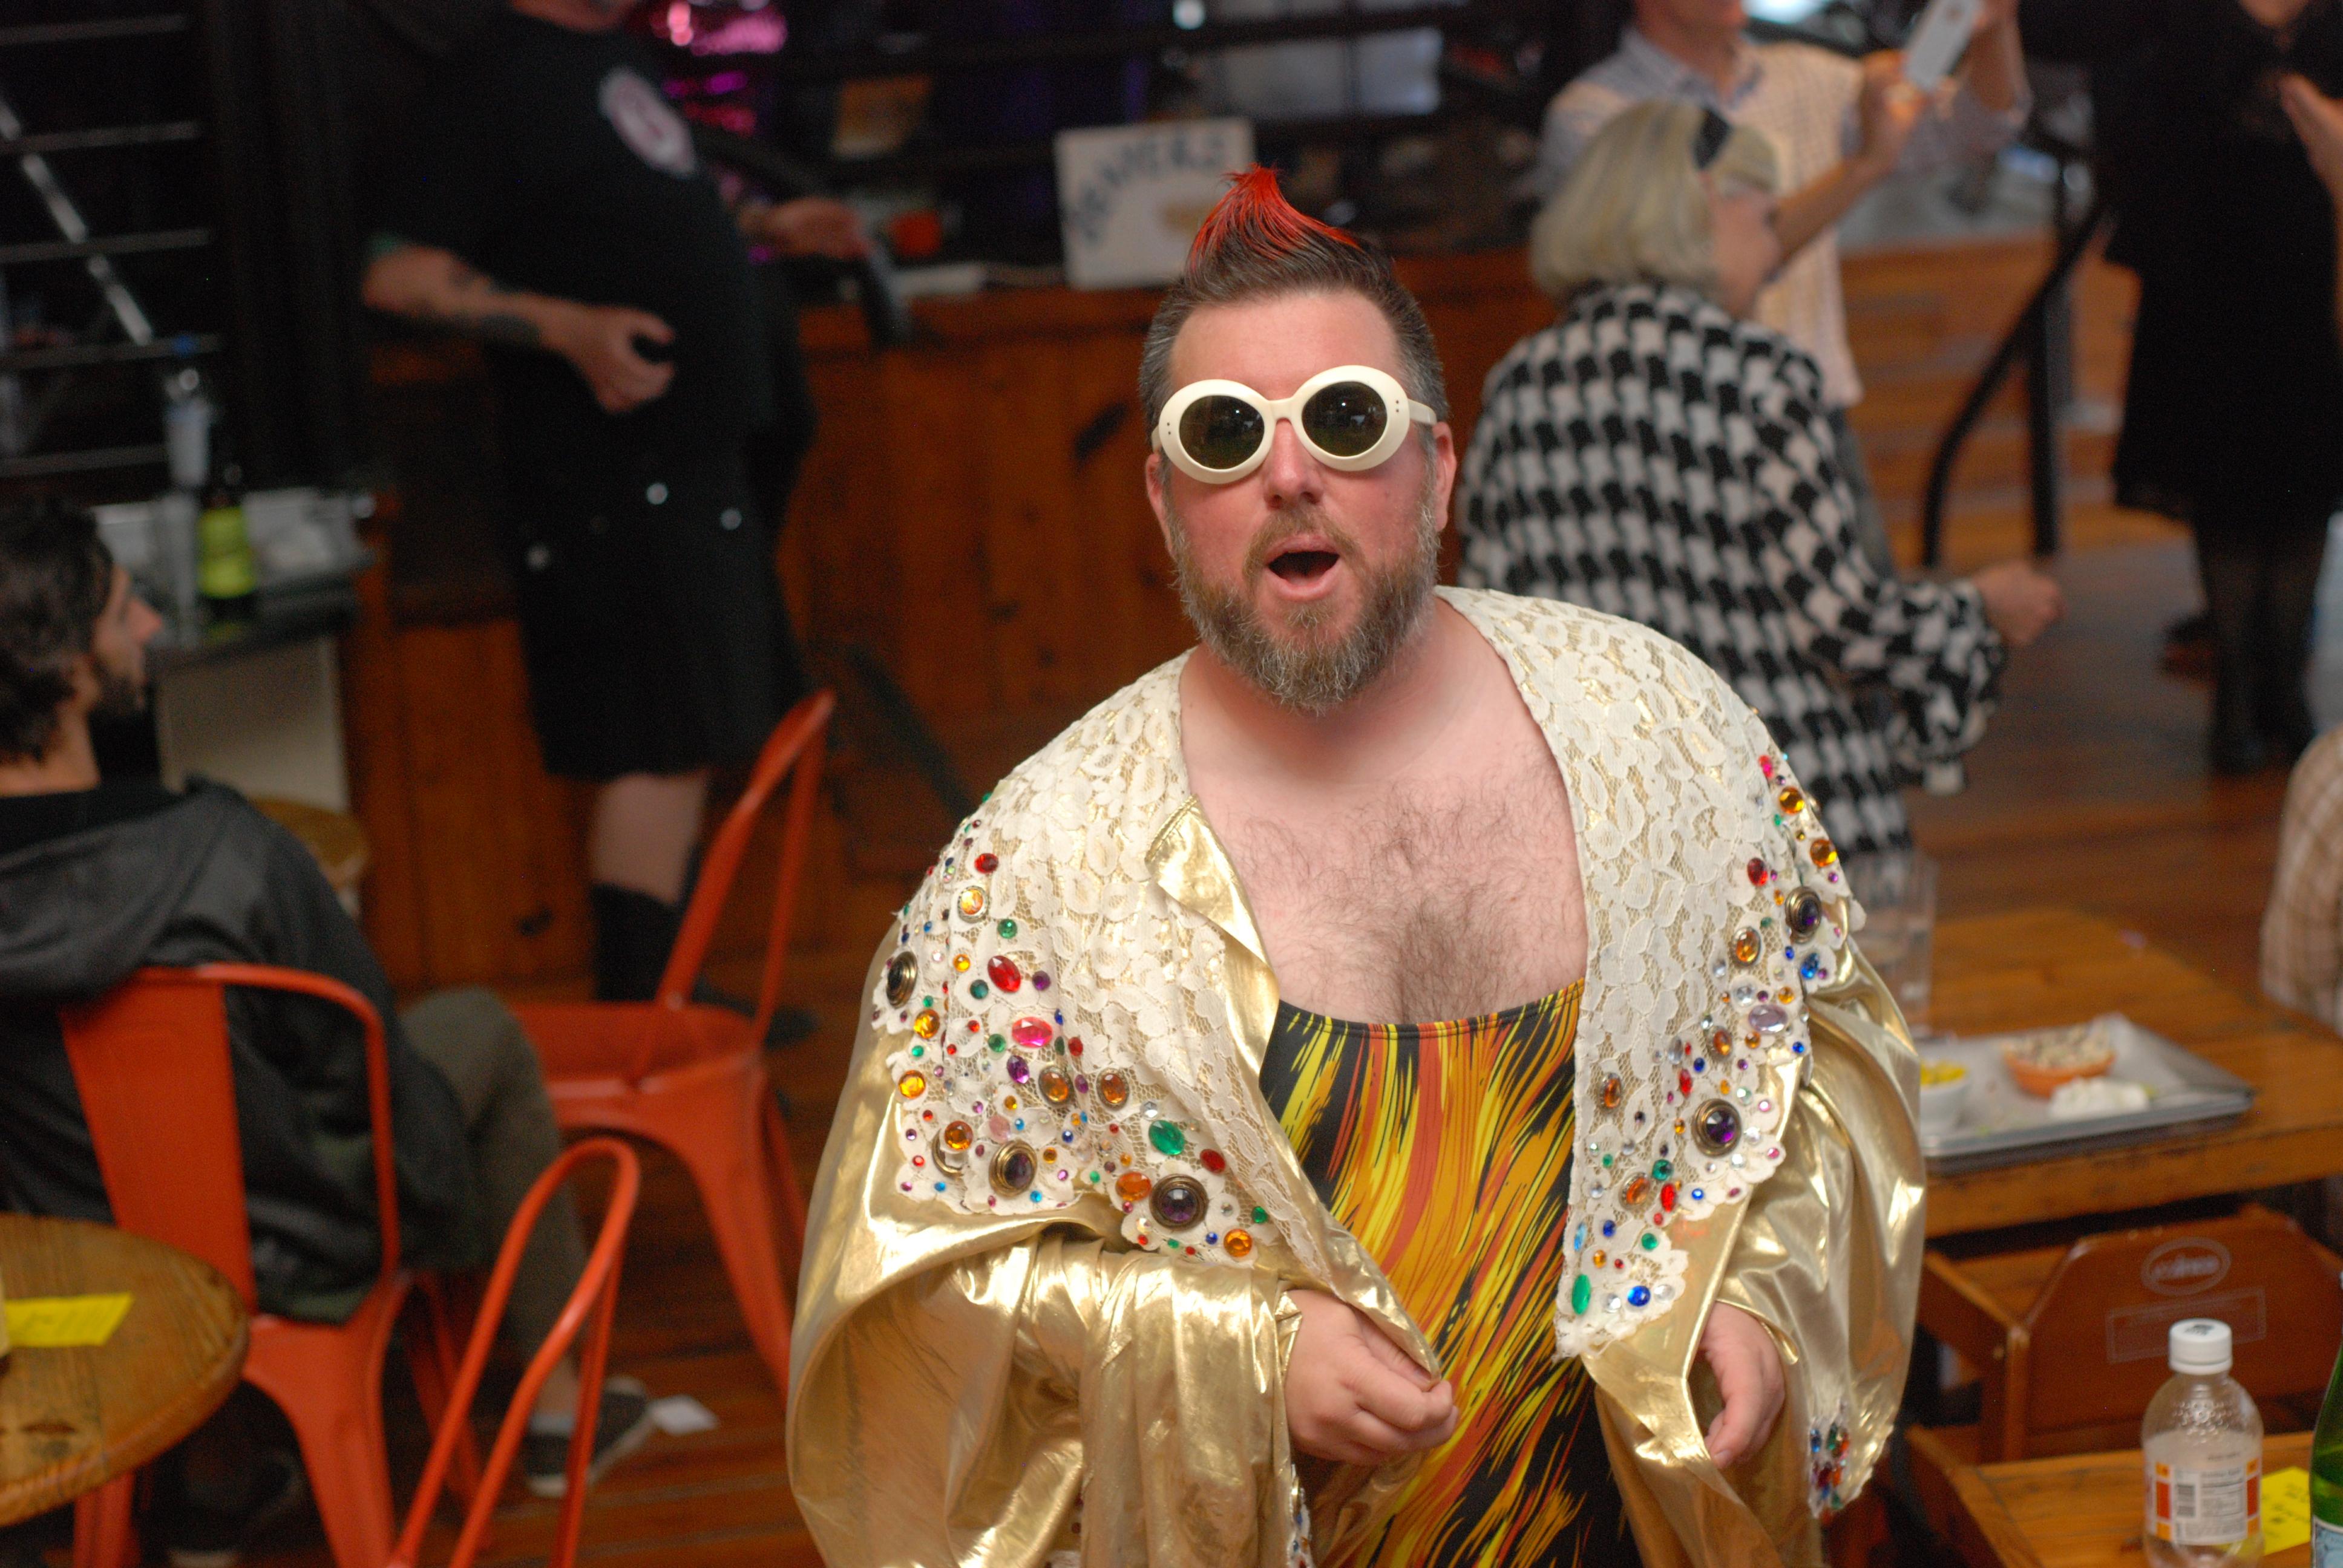 Erik Lars Myers as Twiggy Stardust